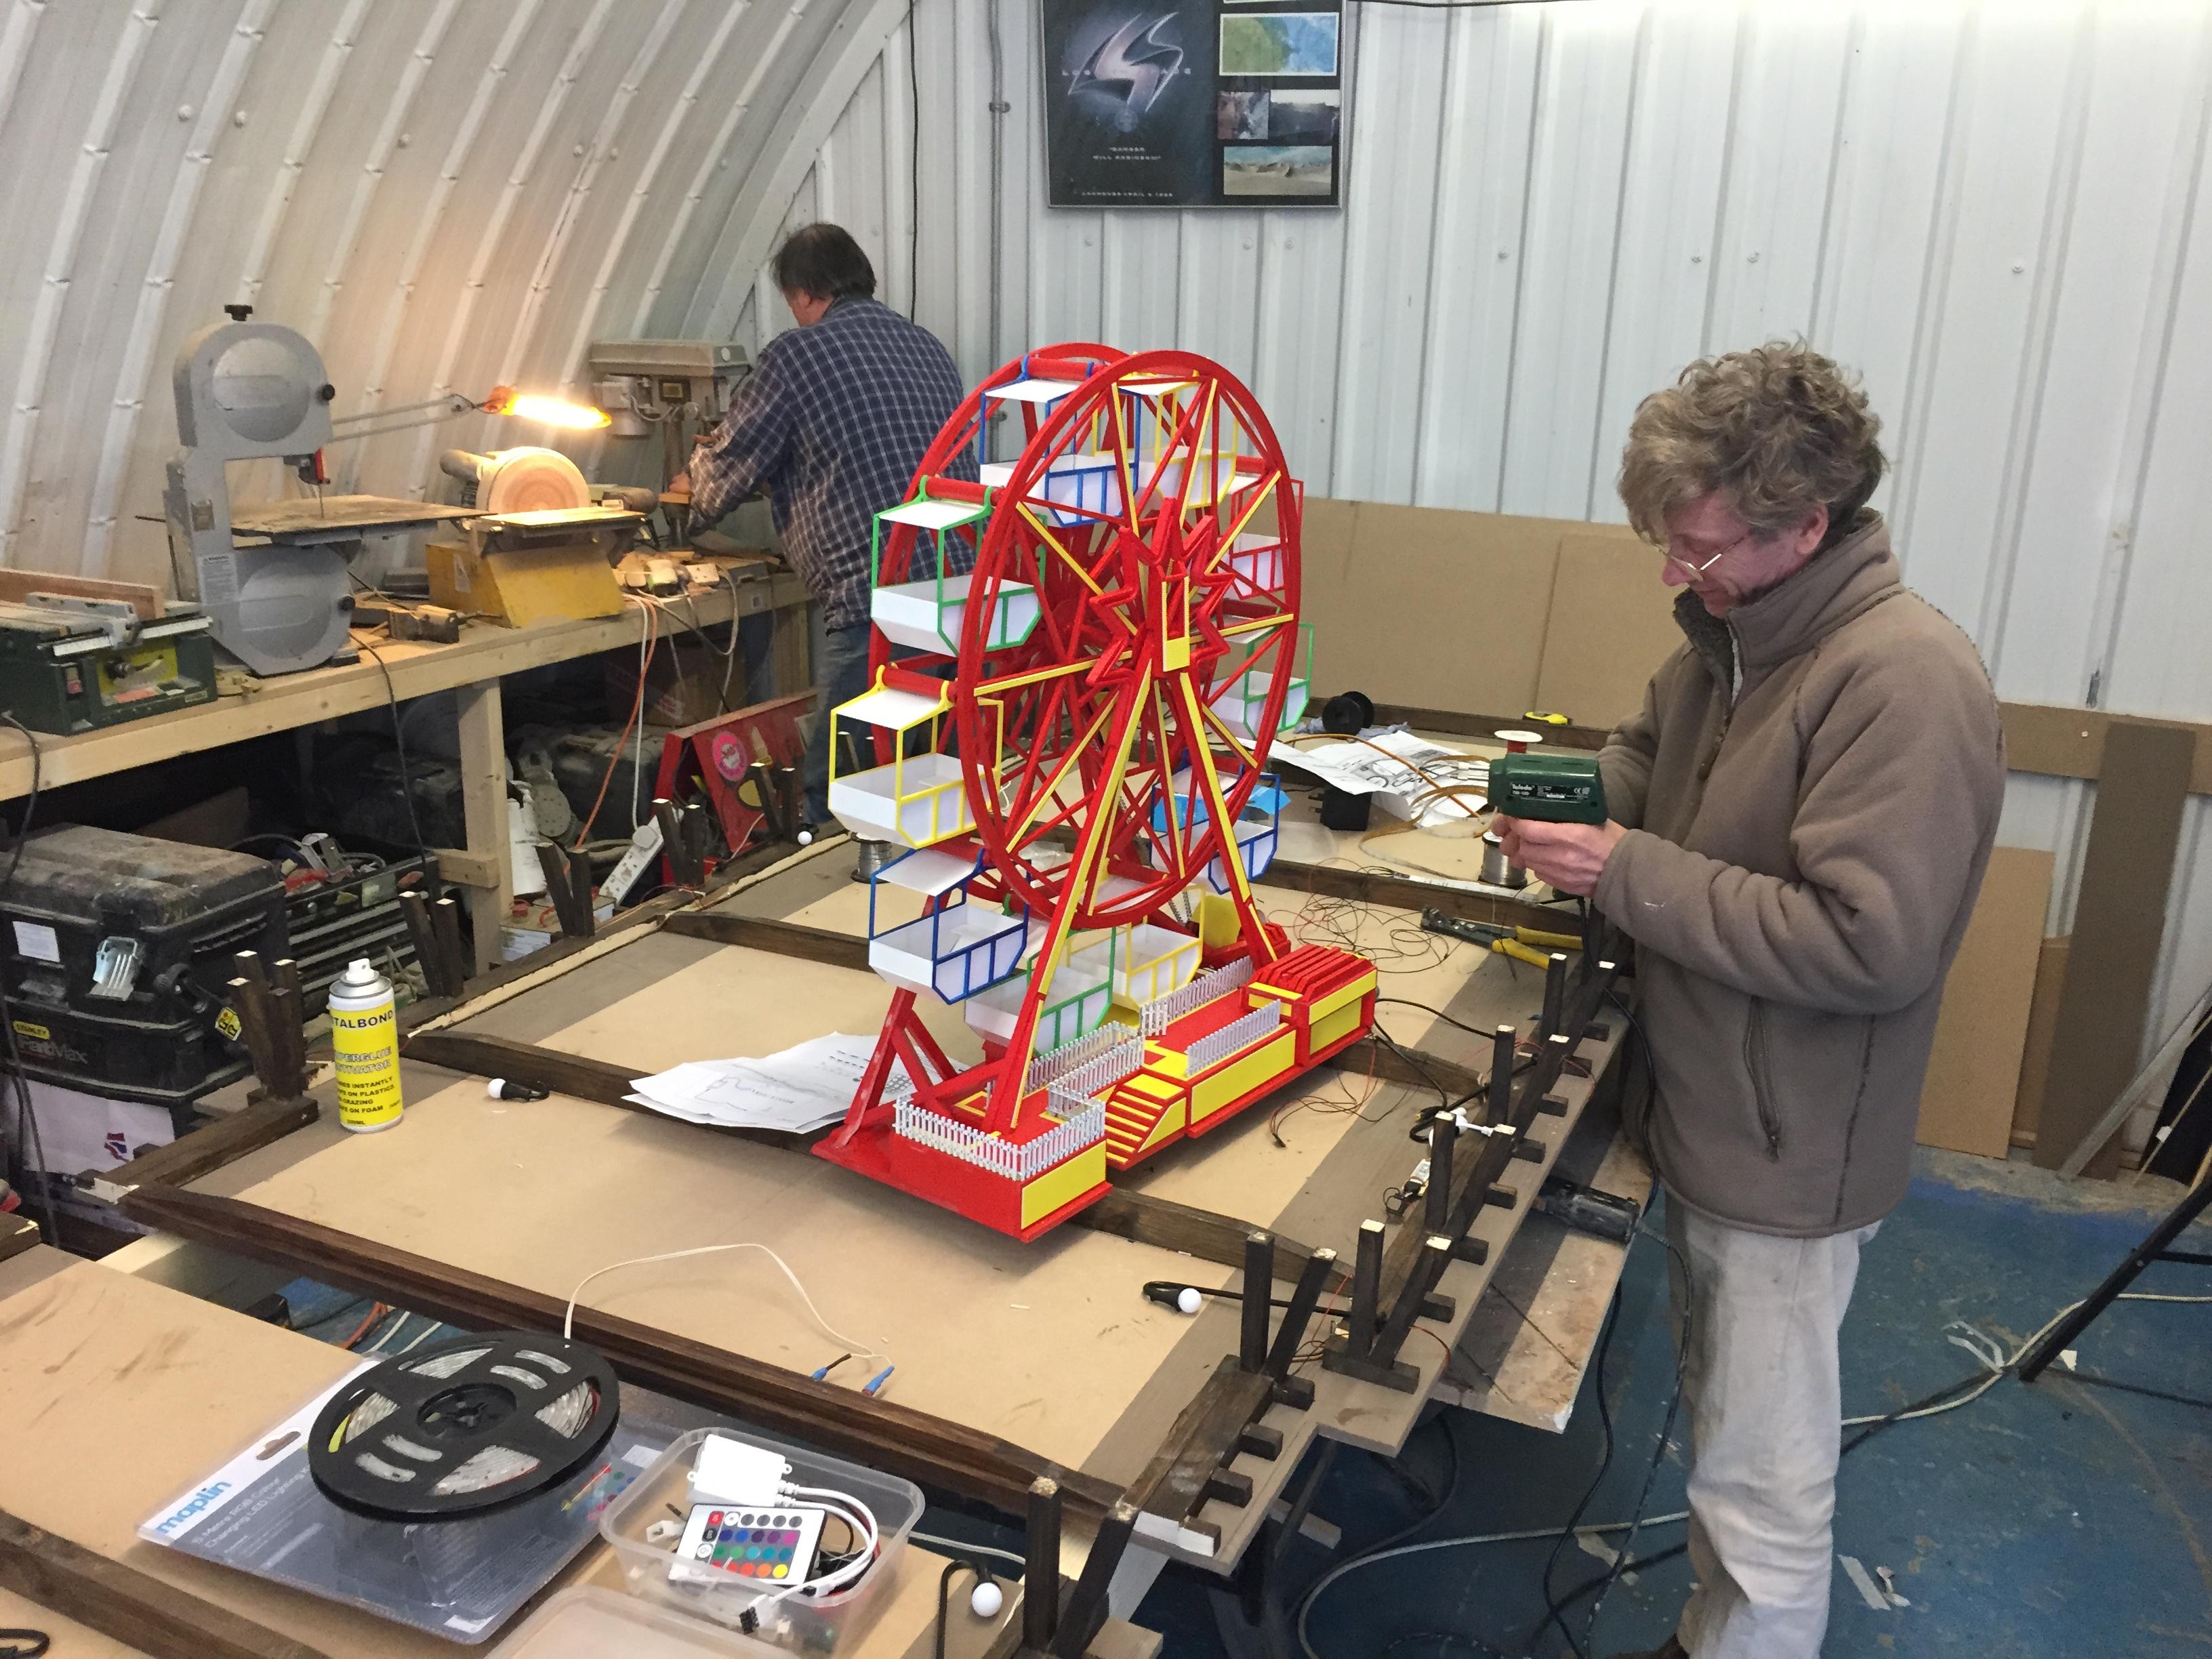 Model makers building miniatures